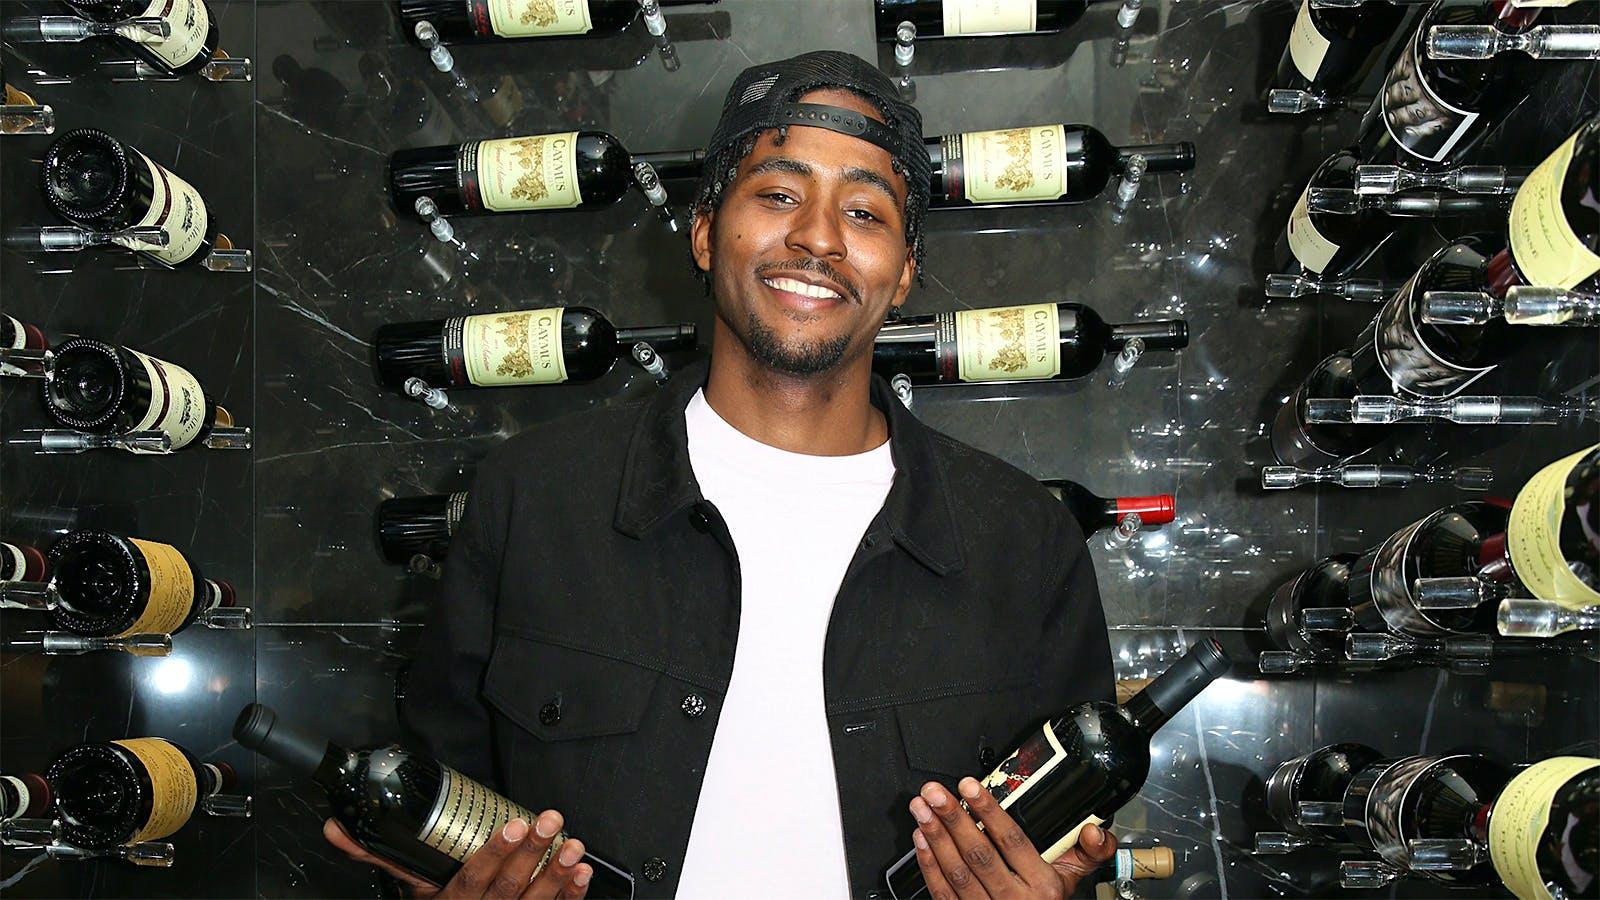 NBA's Moe Harkless Teams with The Prisoner Wine